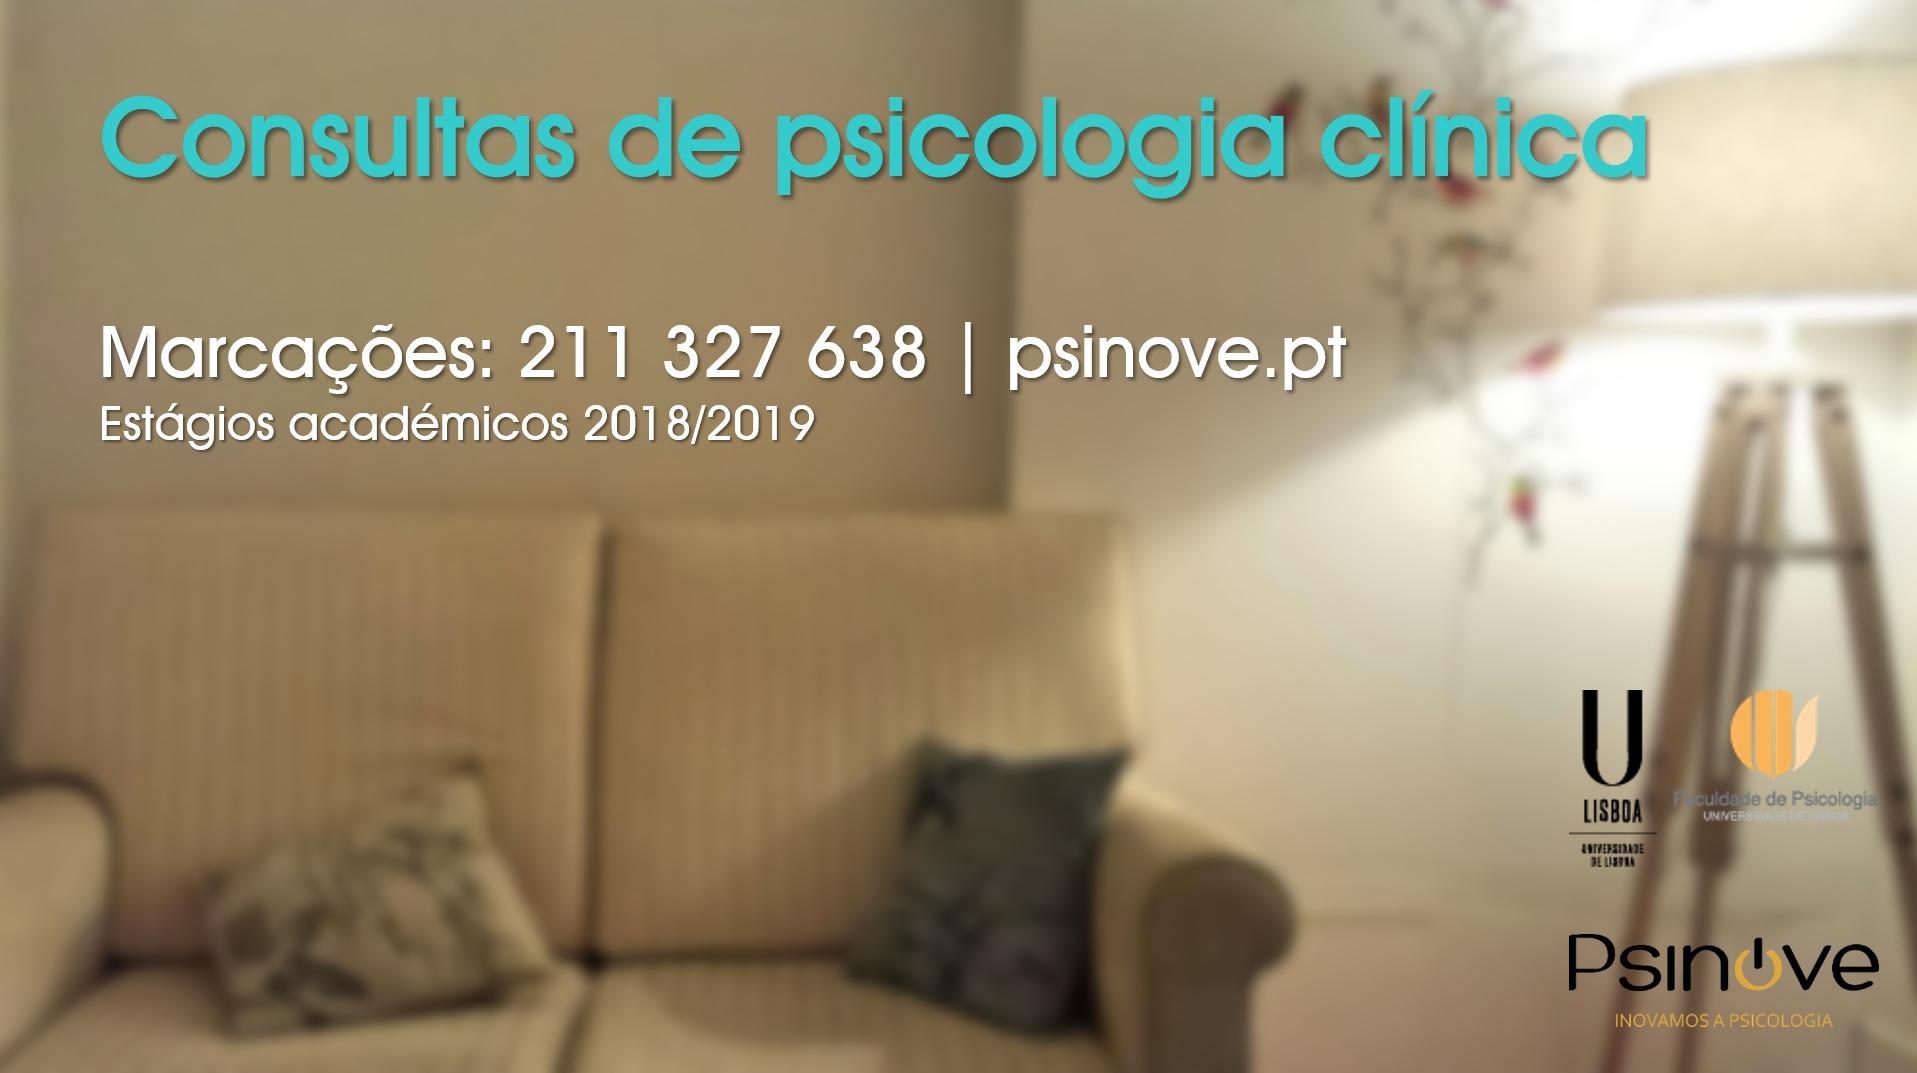 Serviço de apoio psicológico sem custos